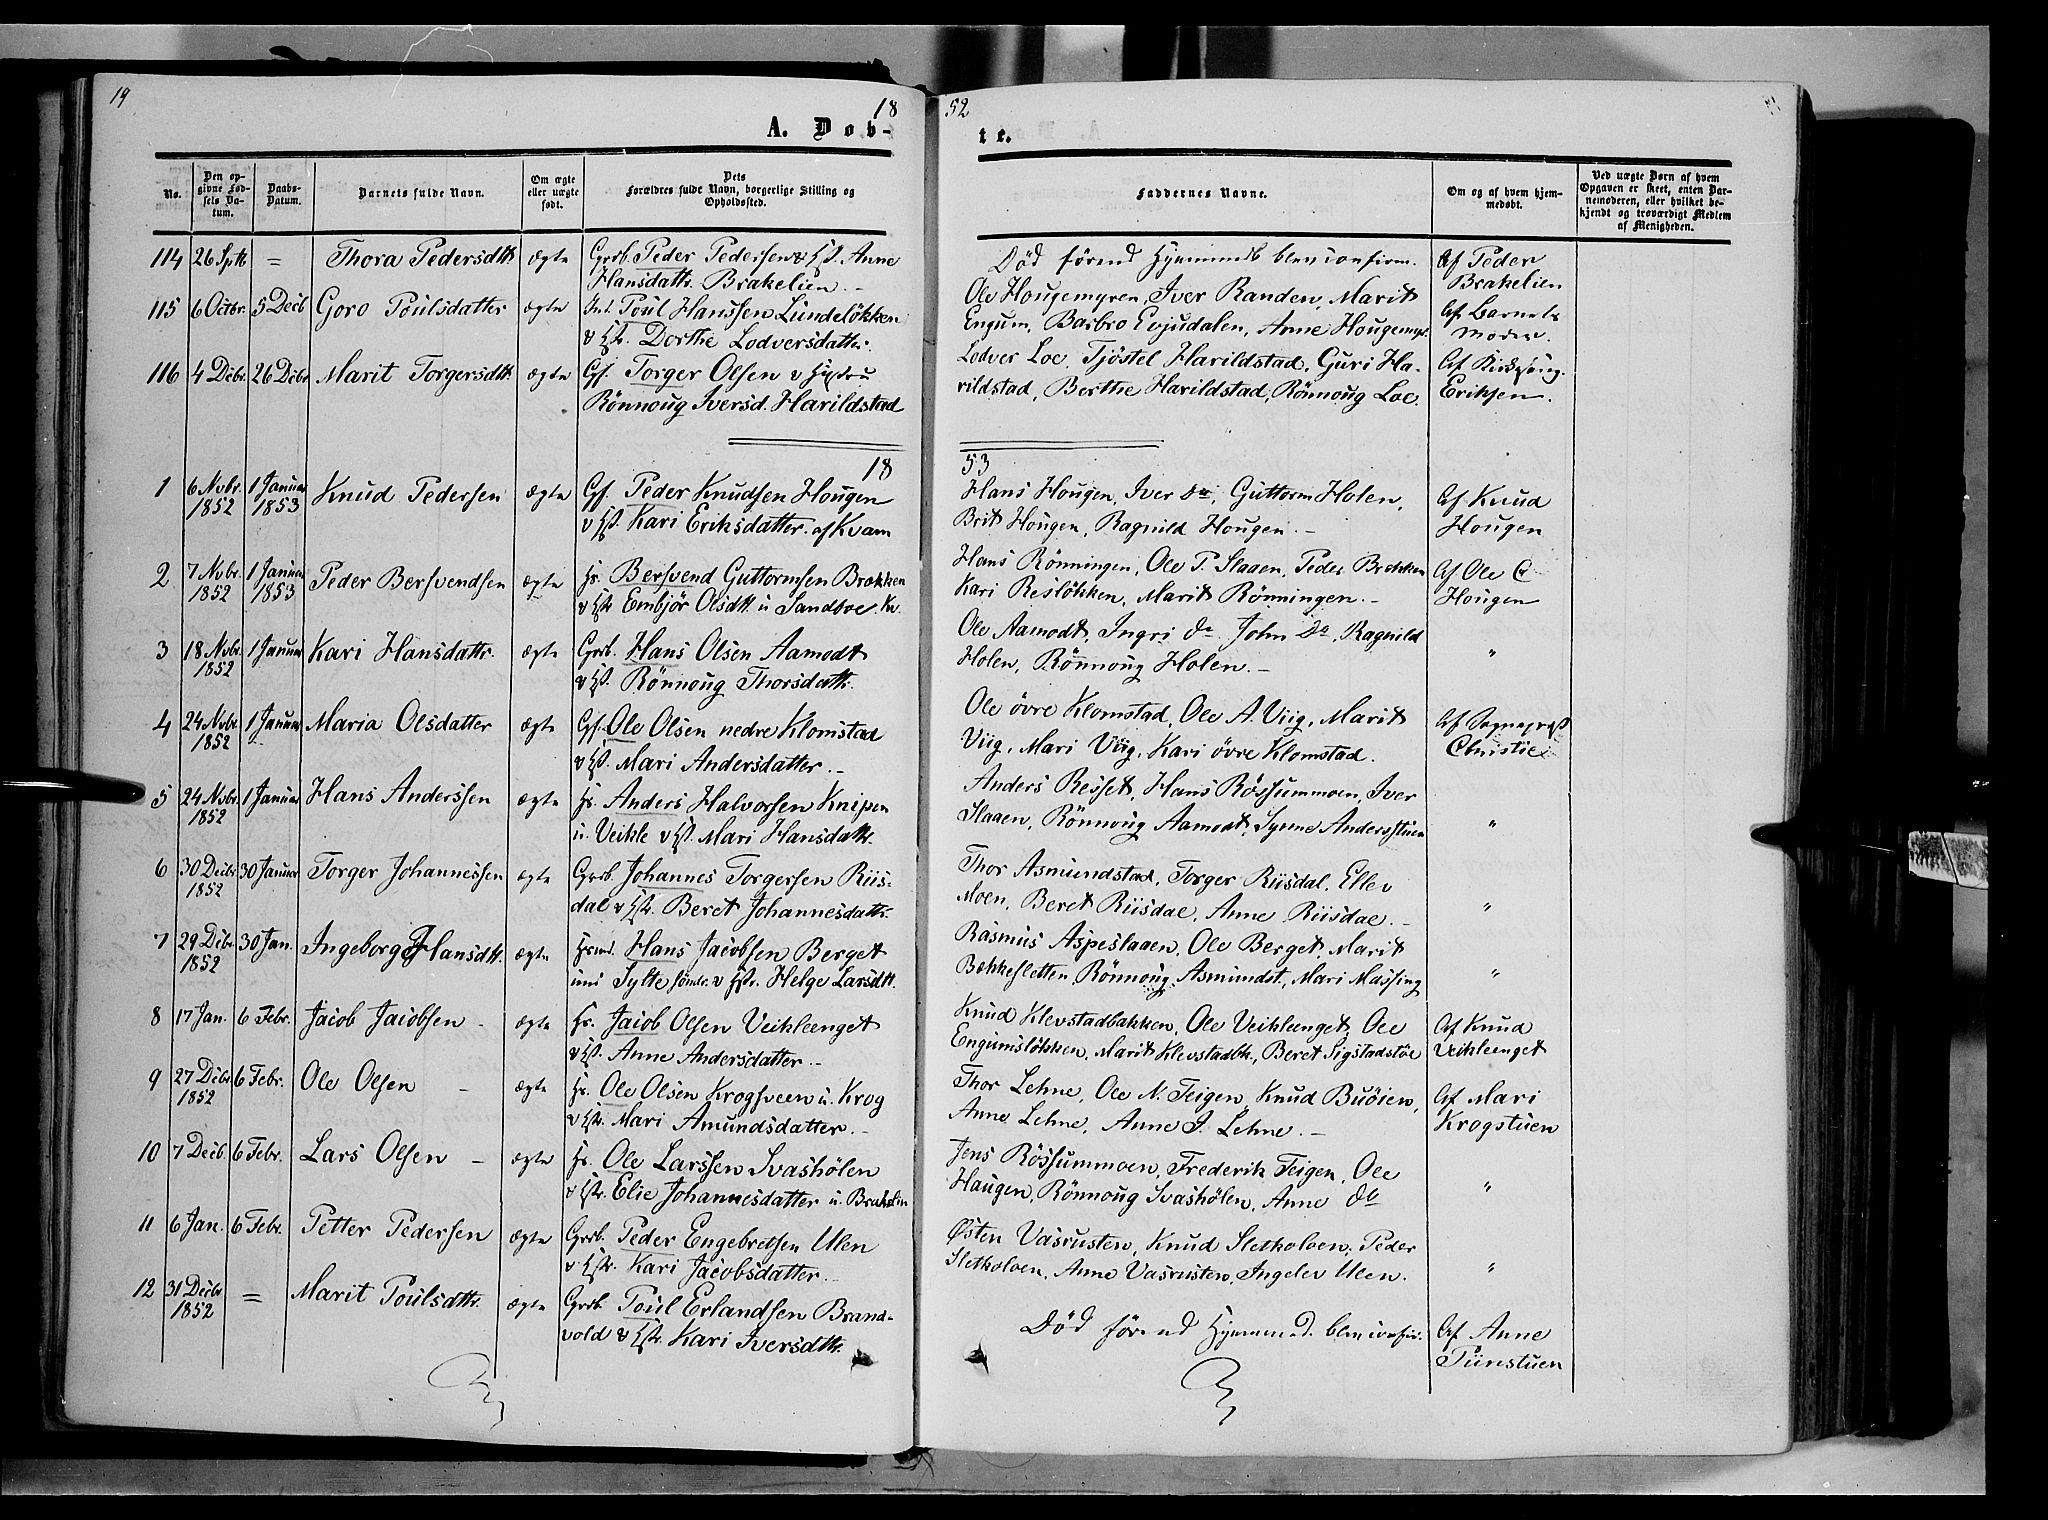 SAH, Nord-Fron prestekontor, Ministerialbok nr. 1, 1851-1864, s. 19